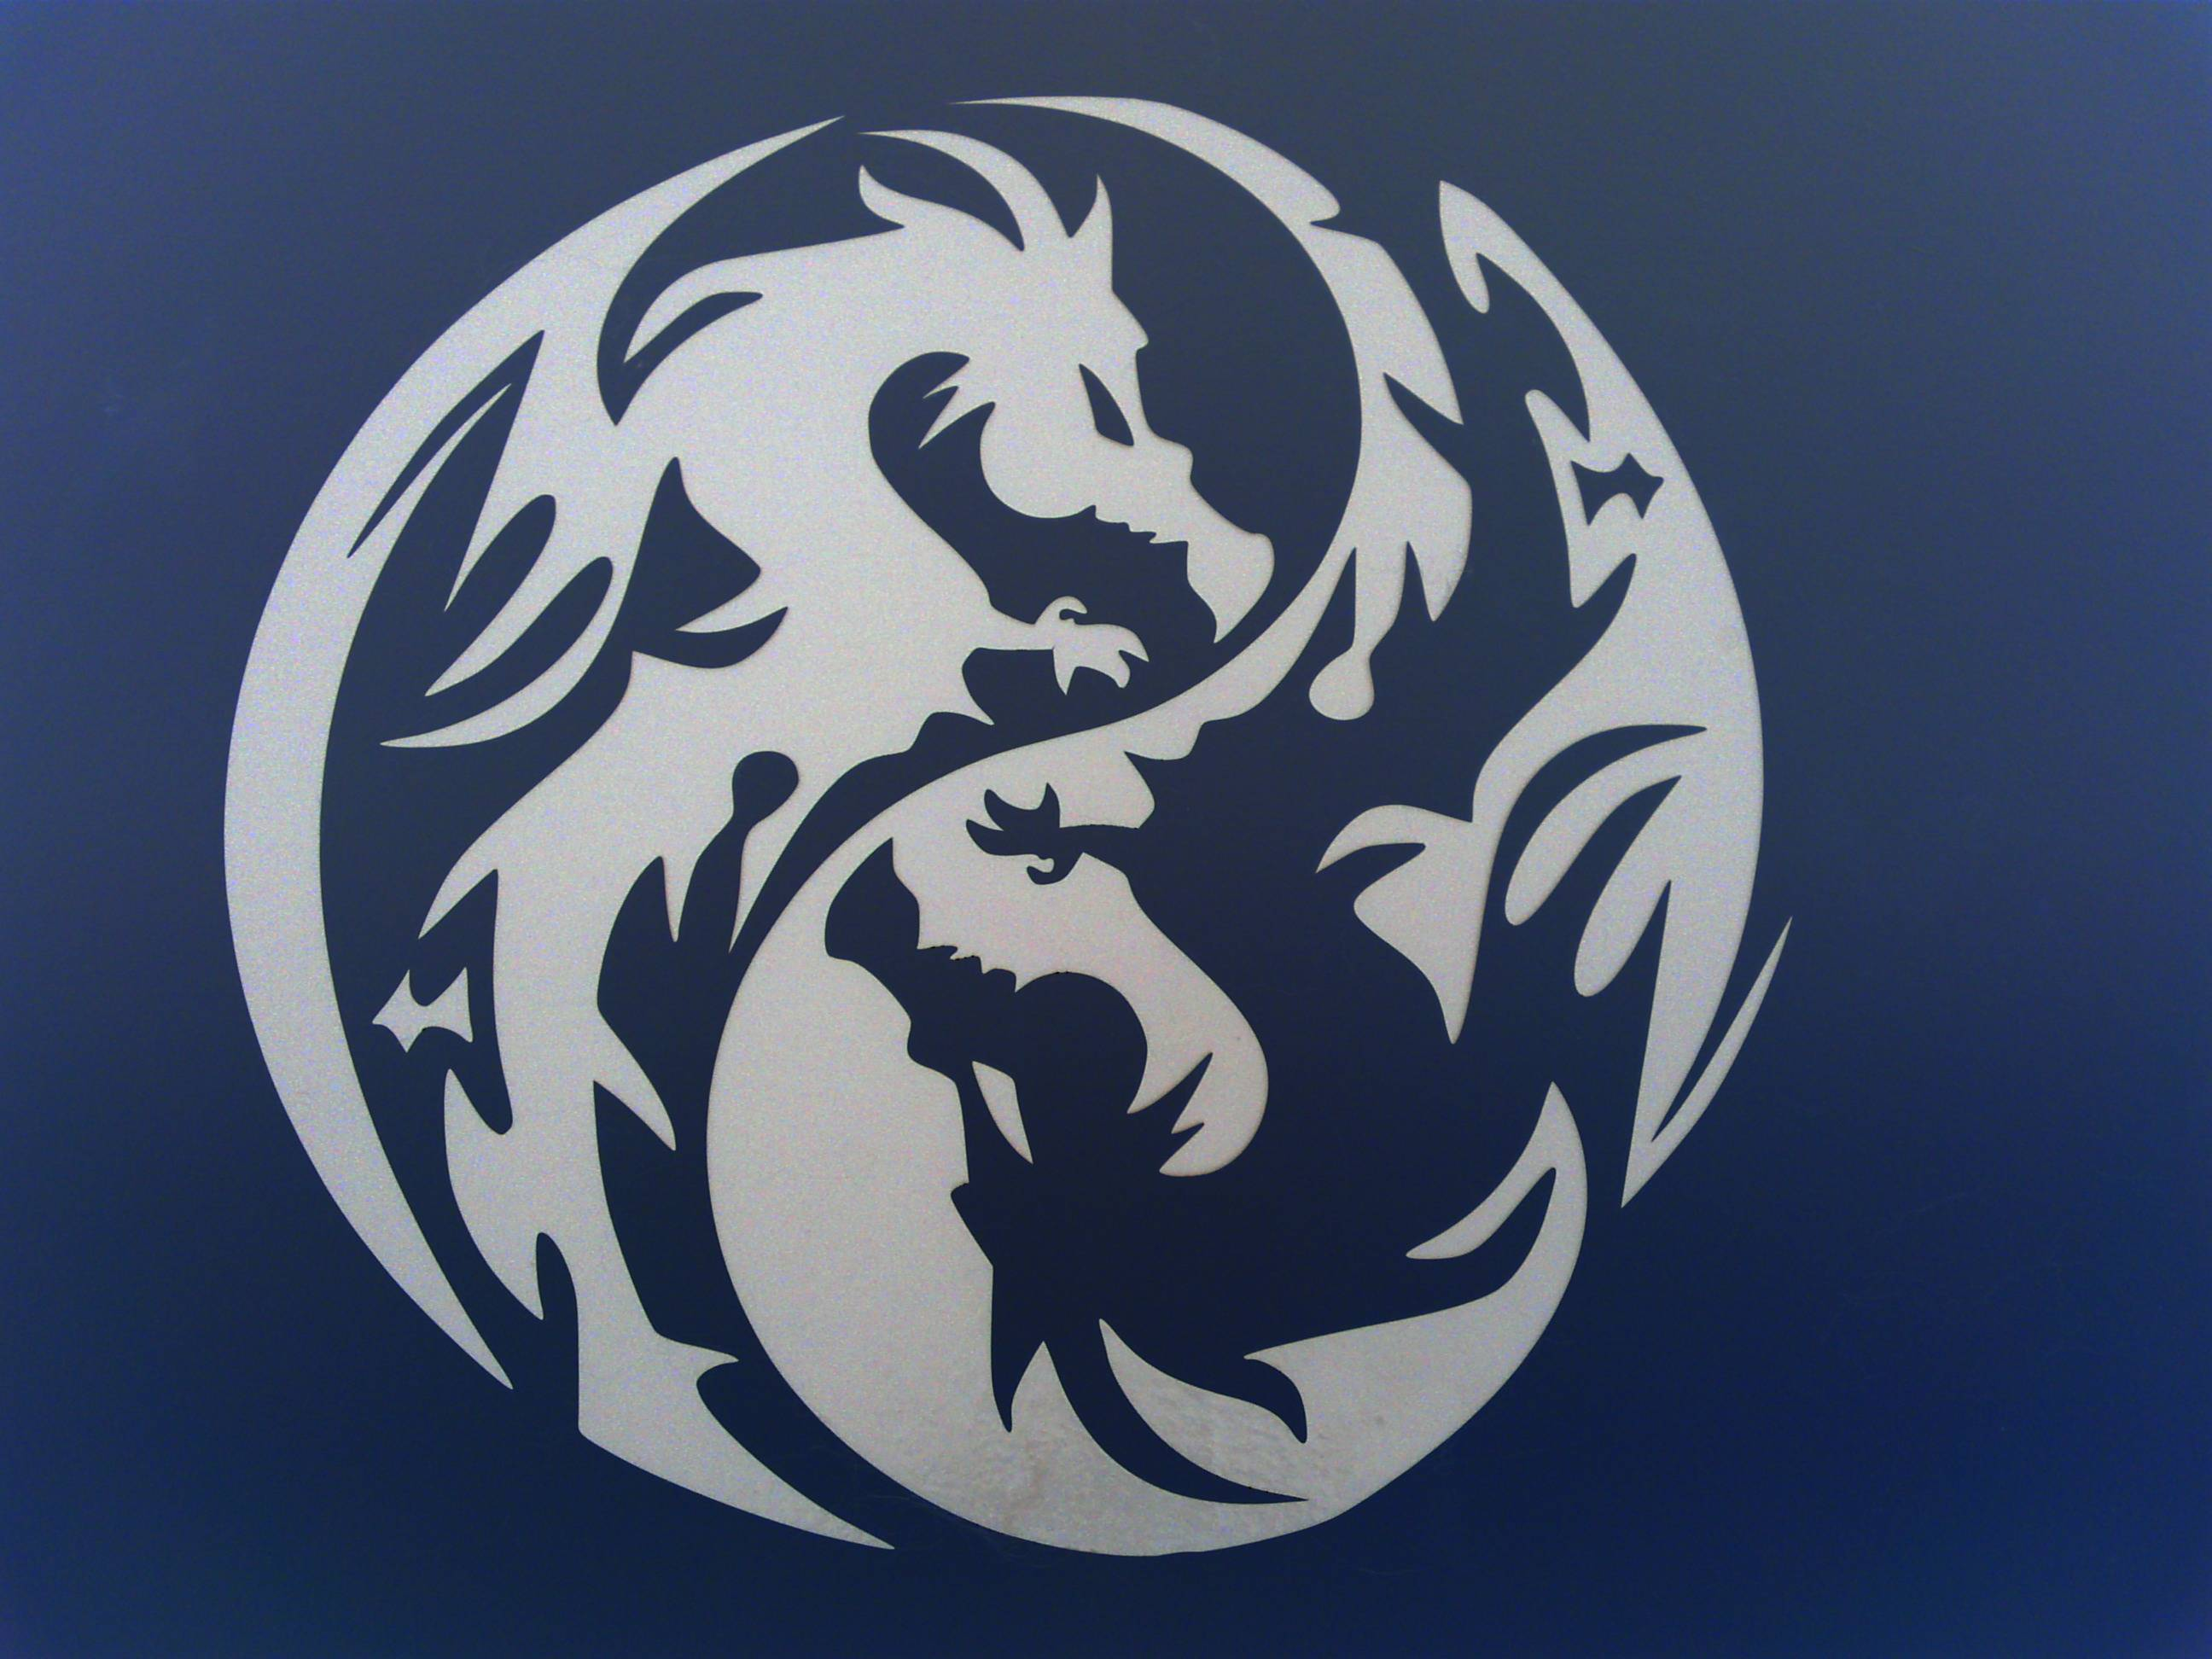 Dragon Yin Yang Wallpapers - Wallpaper Cave